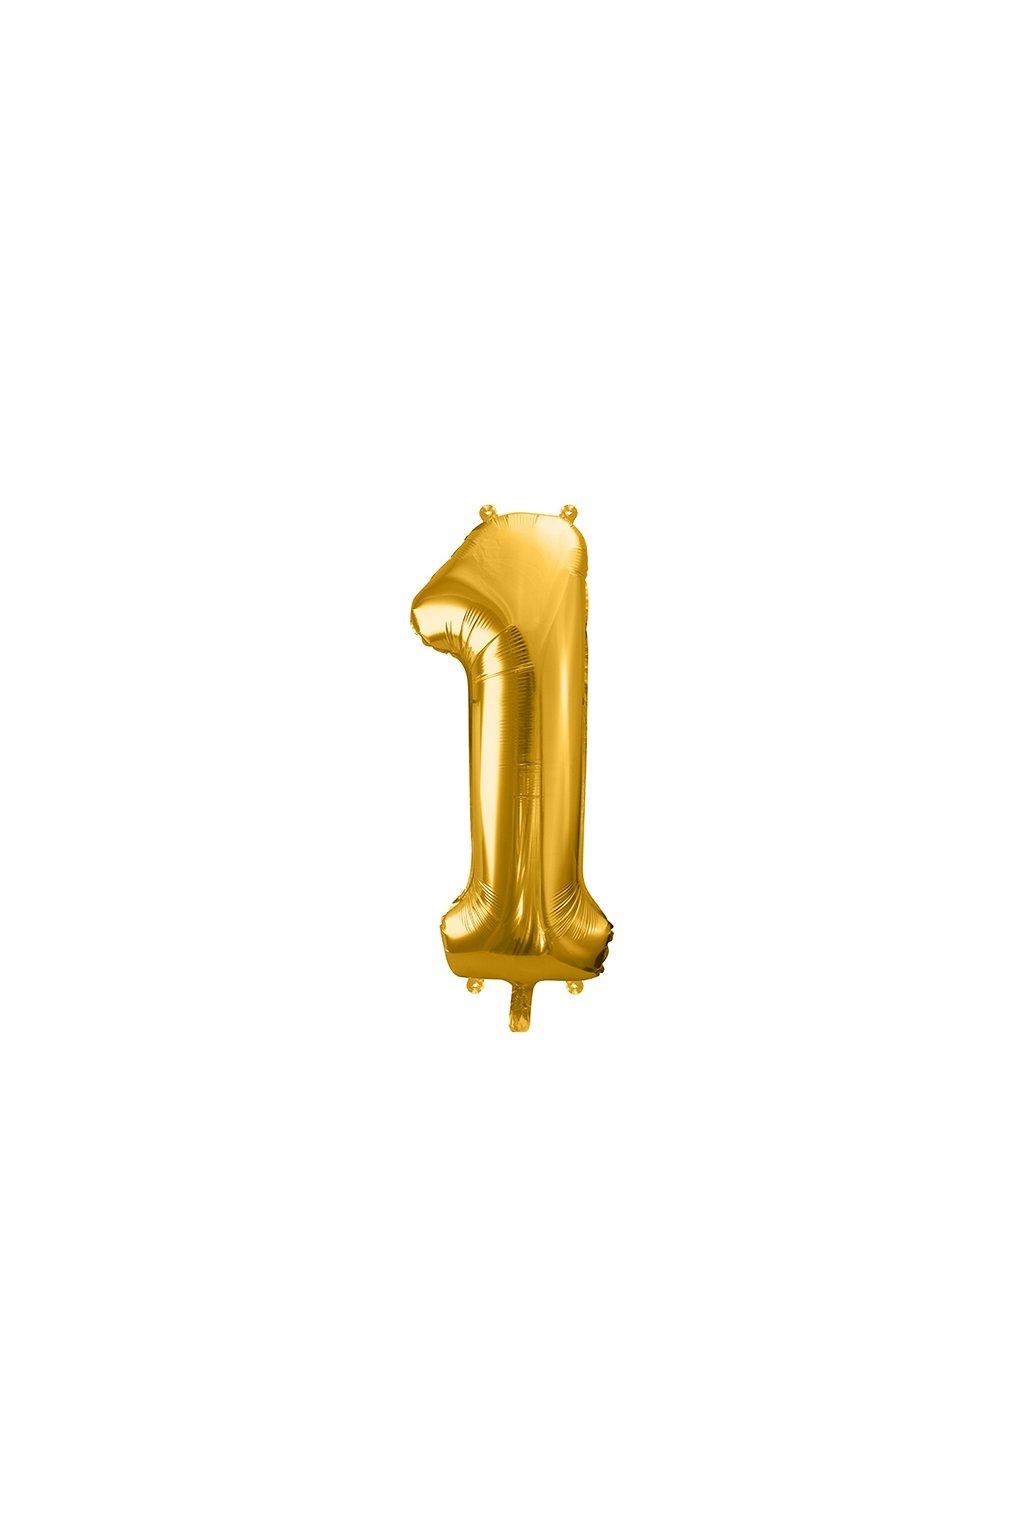 Fóliový balónek číslo 1 - zlatý 86cm